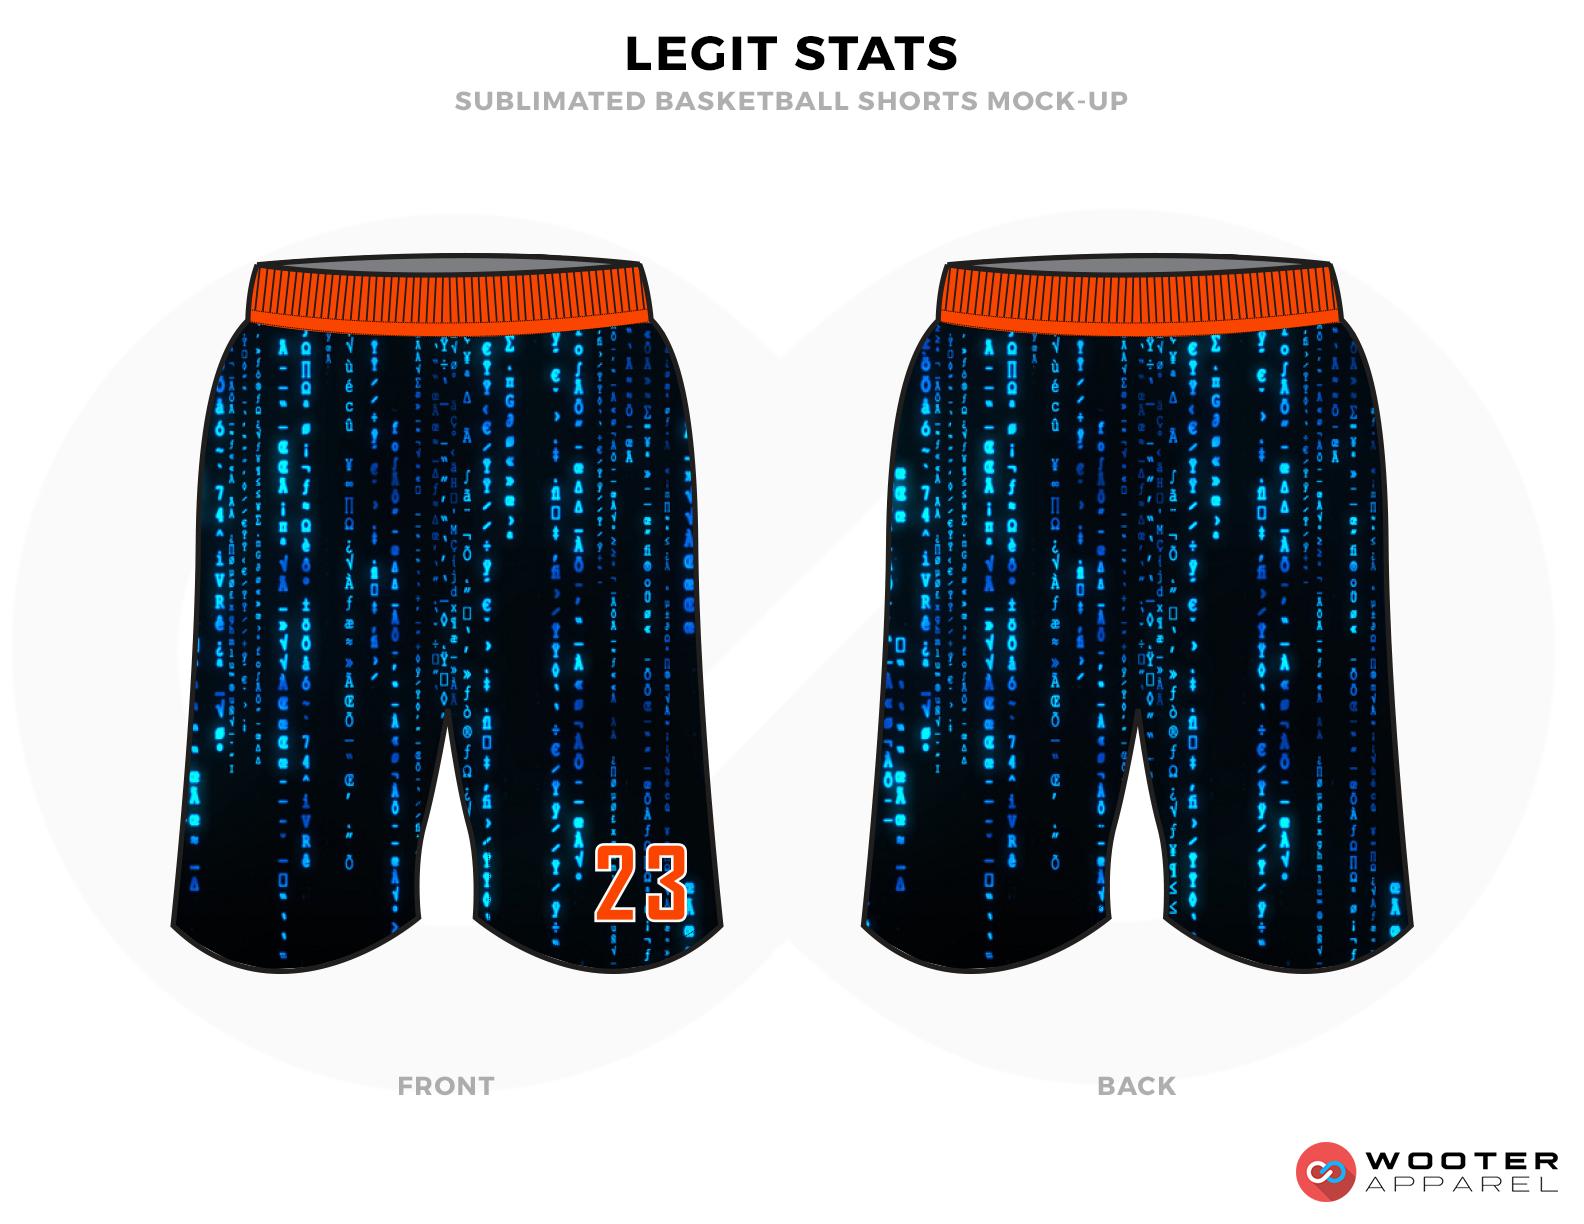 LEGIT STATS Black Blue and Orange Basketball Uniforms, Shorts